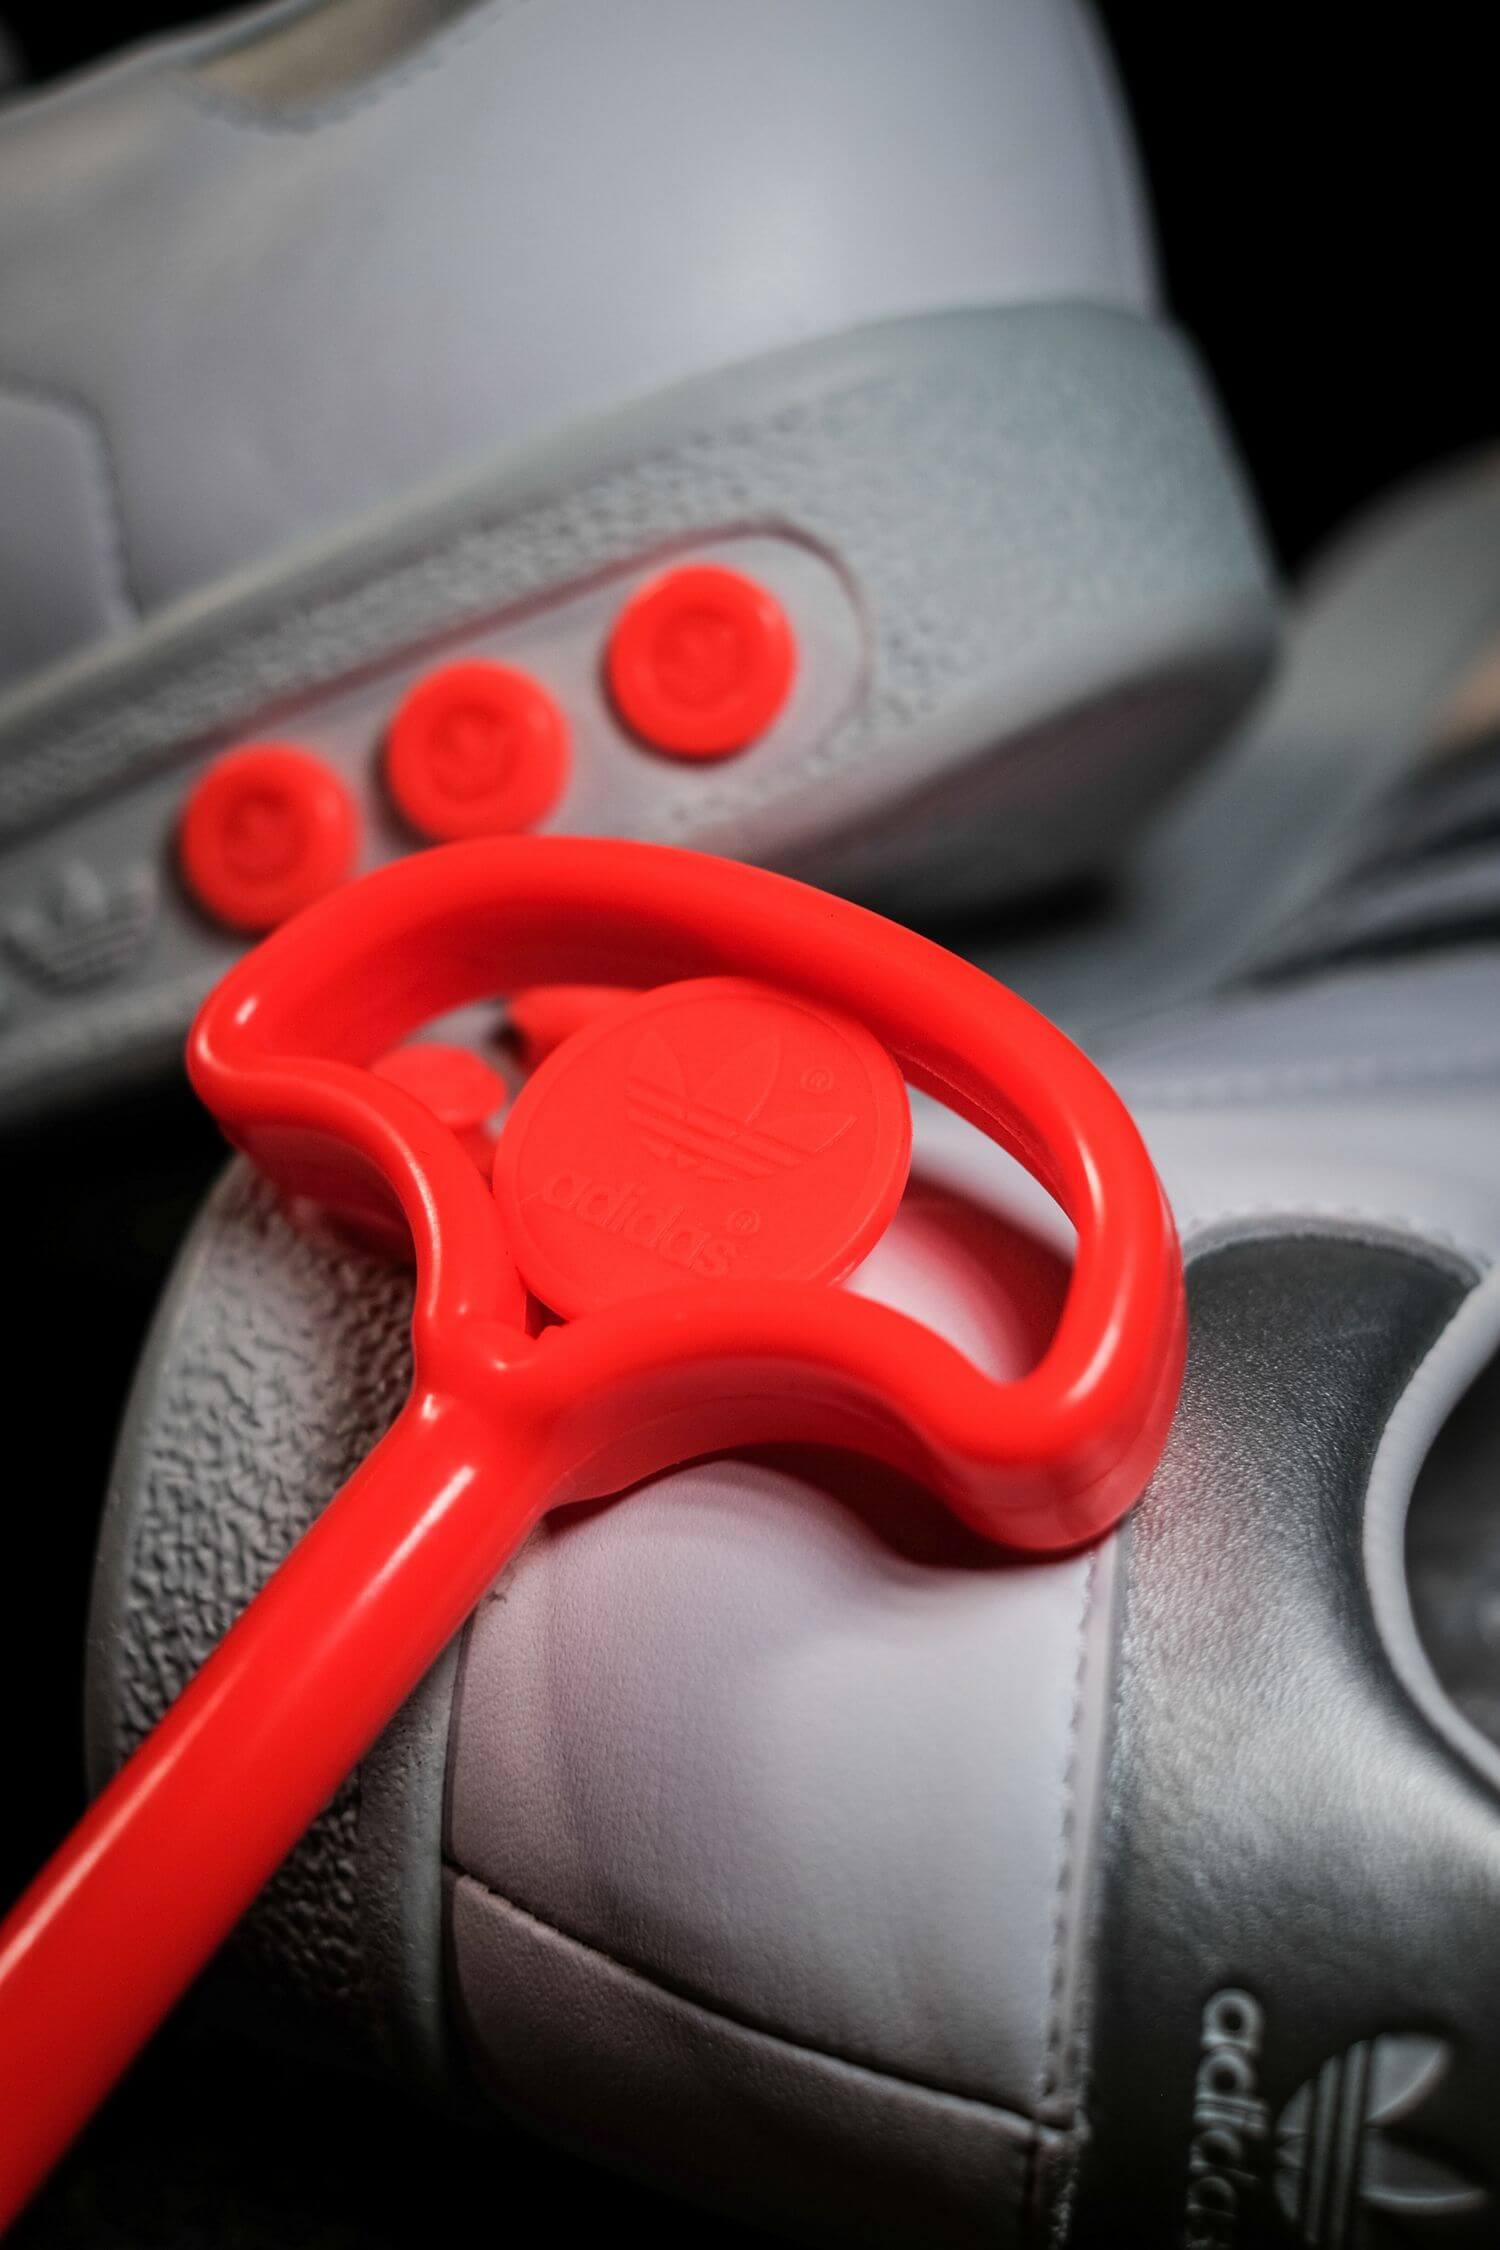 adidas - G.S. - cloud white/silver metallic/wonder white- H01818 - neon orange plug tool